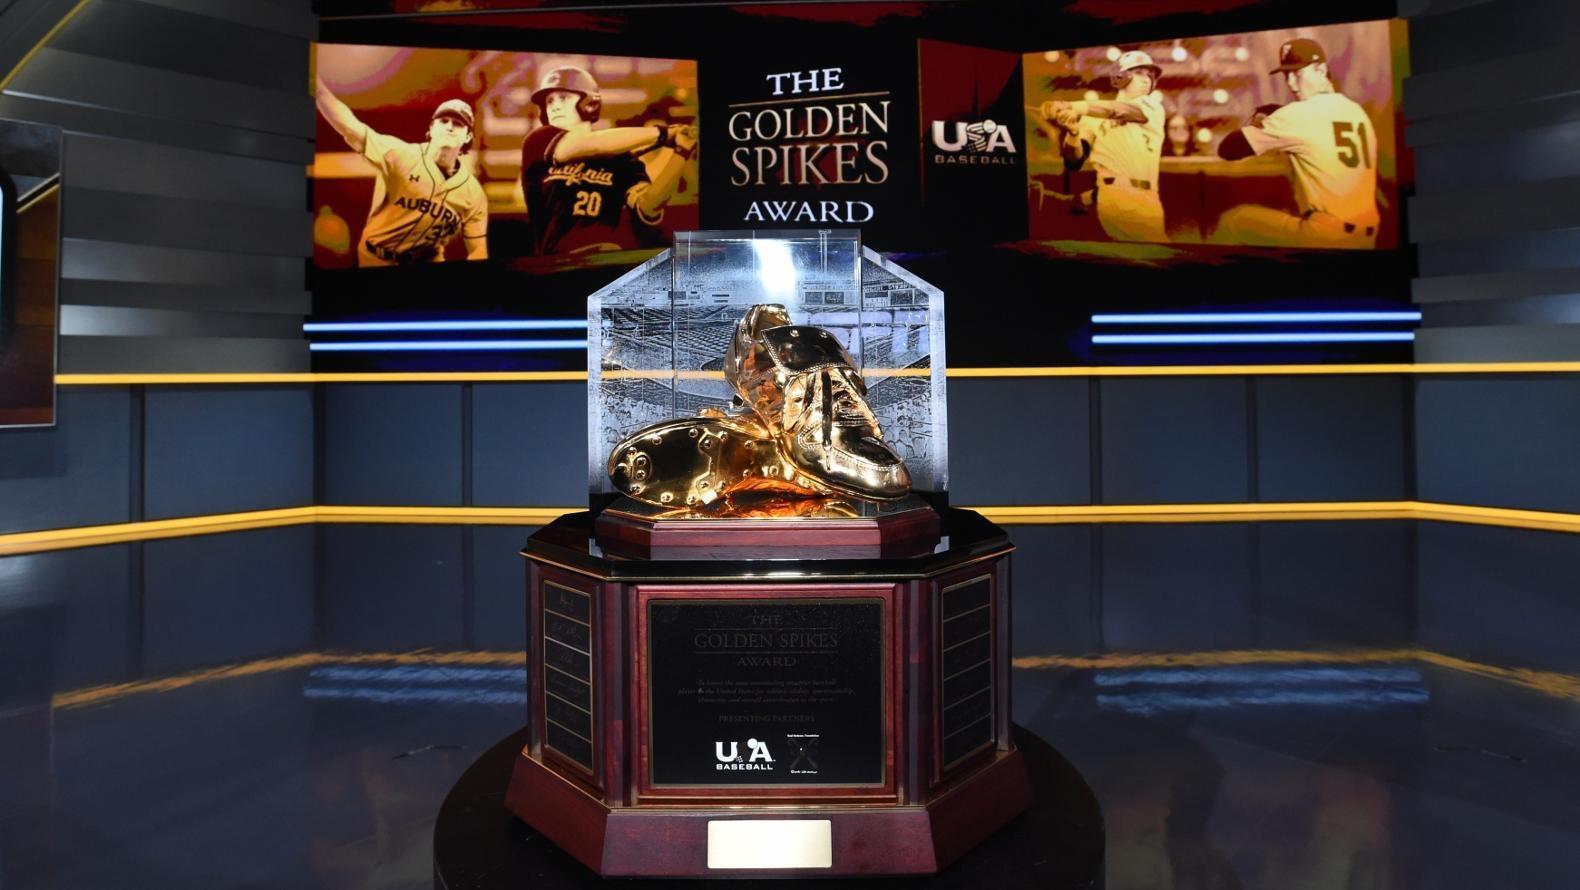 The Golden Spikes Award.